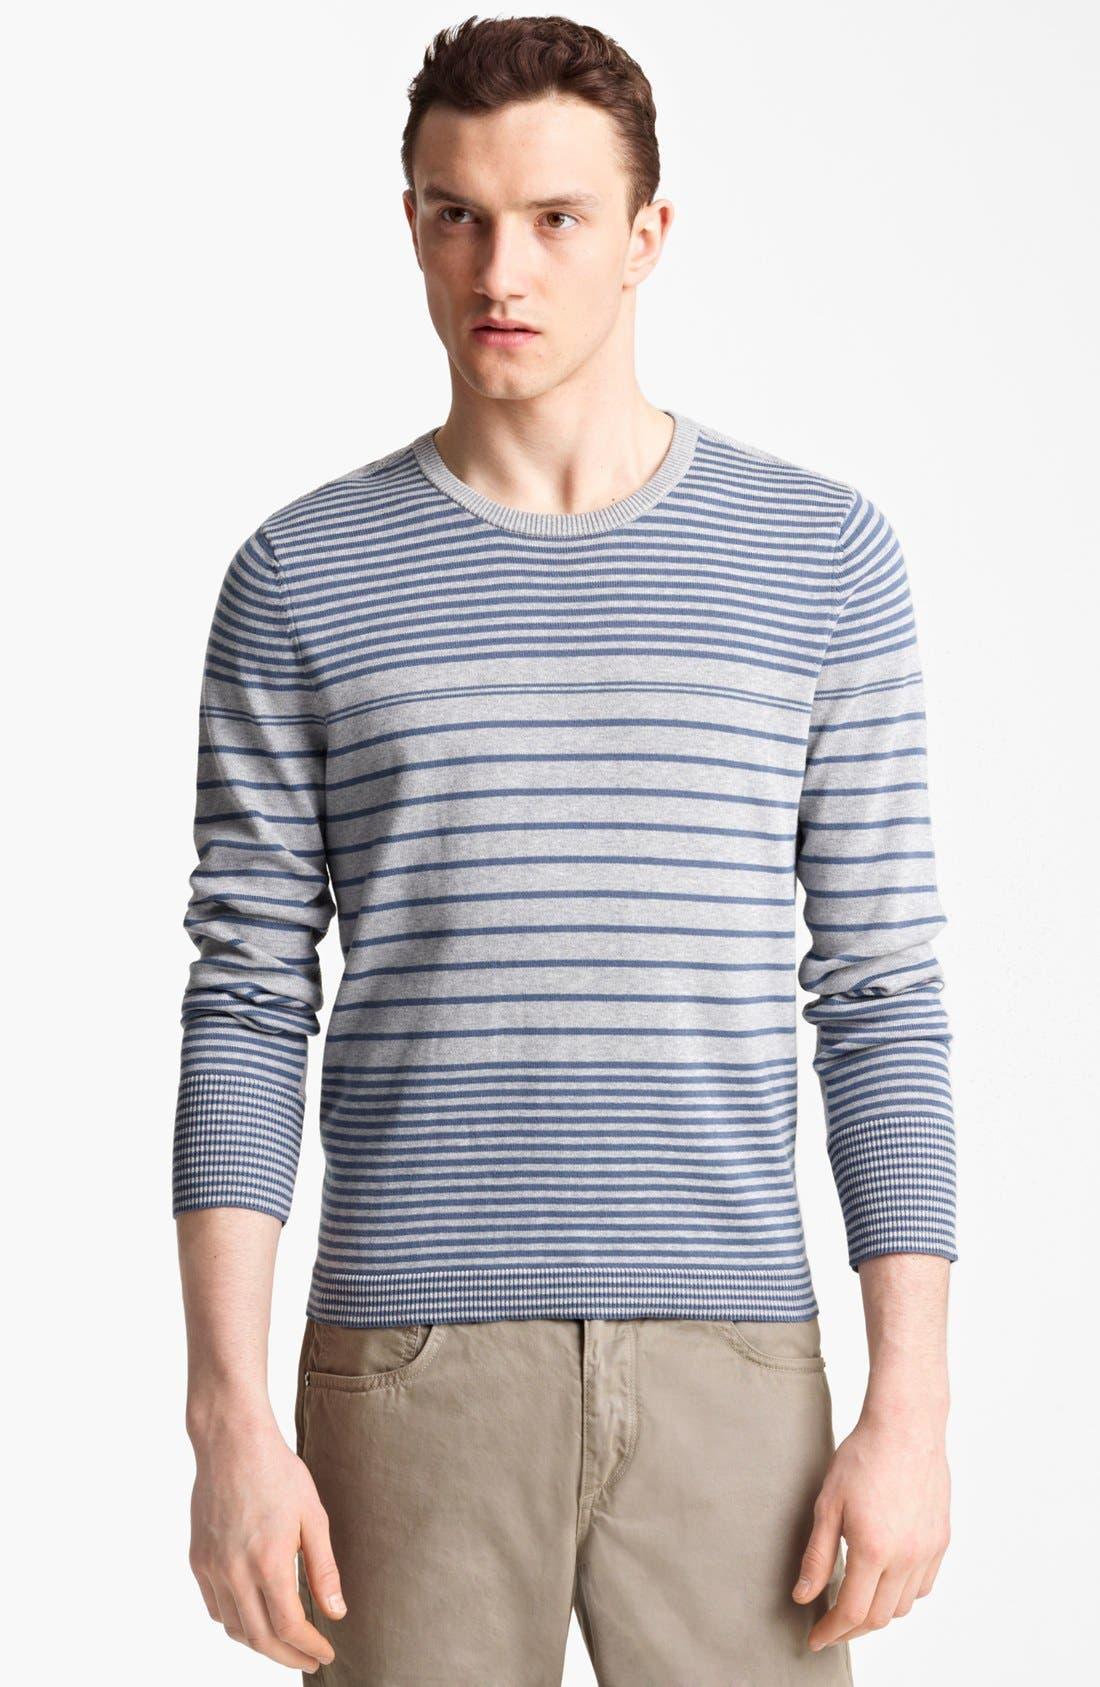 Main Image - rag & bone 'Frankie' Crewneck Sweatshirt